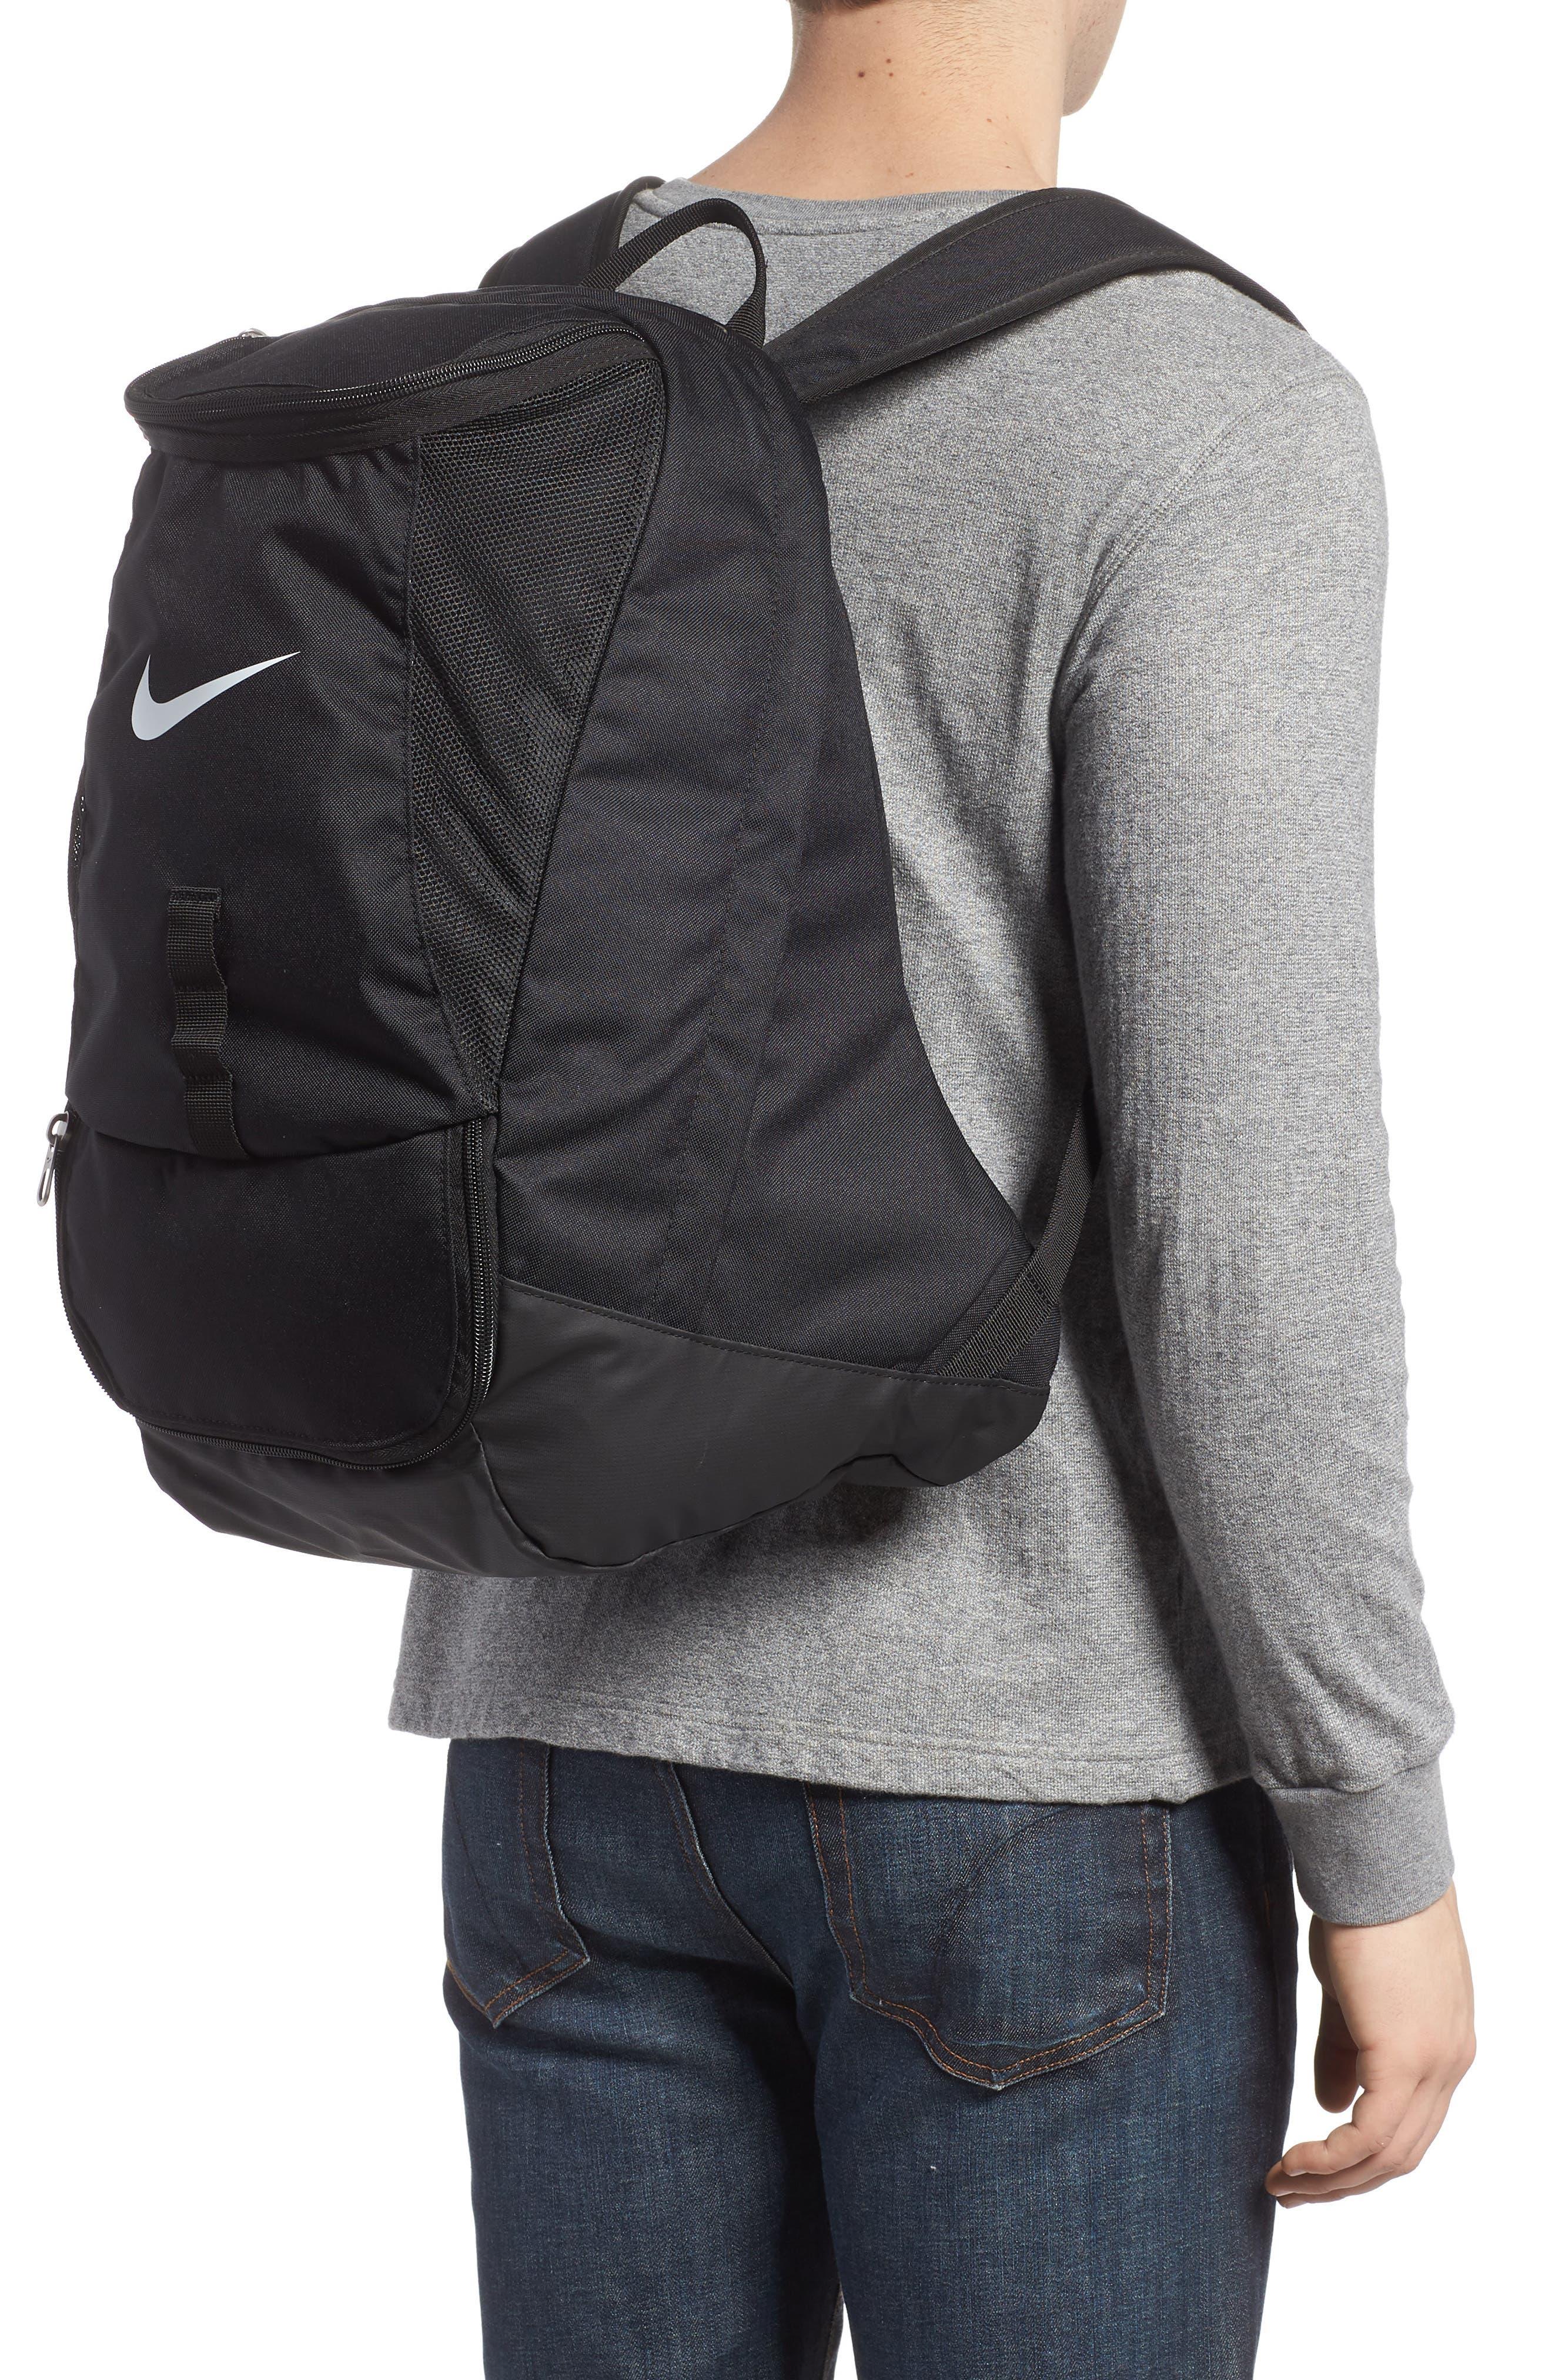 Club Team Backpack,                             Alternate thumbnail 2, color,                             Black/ Black/ White